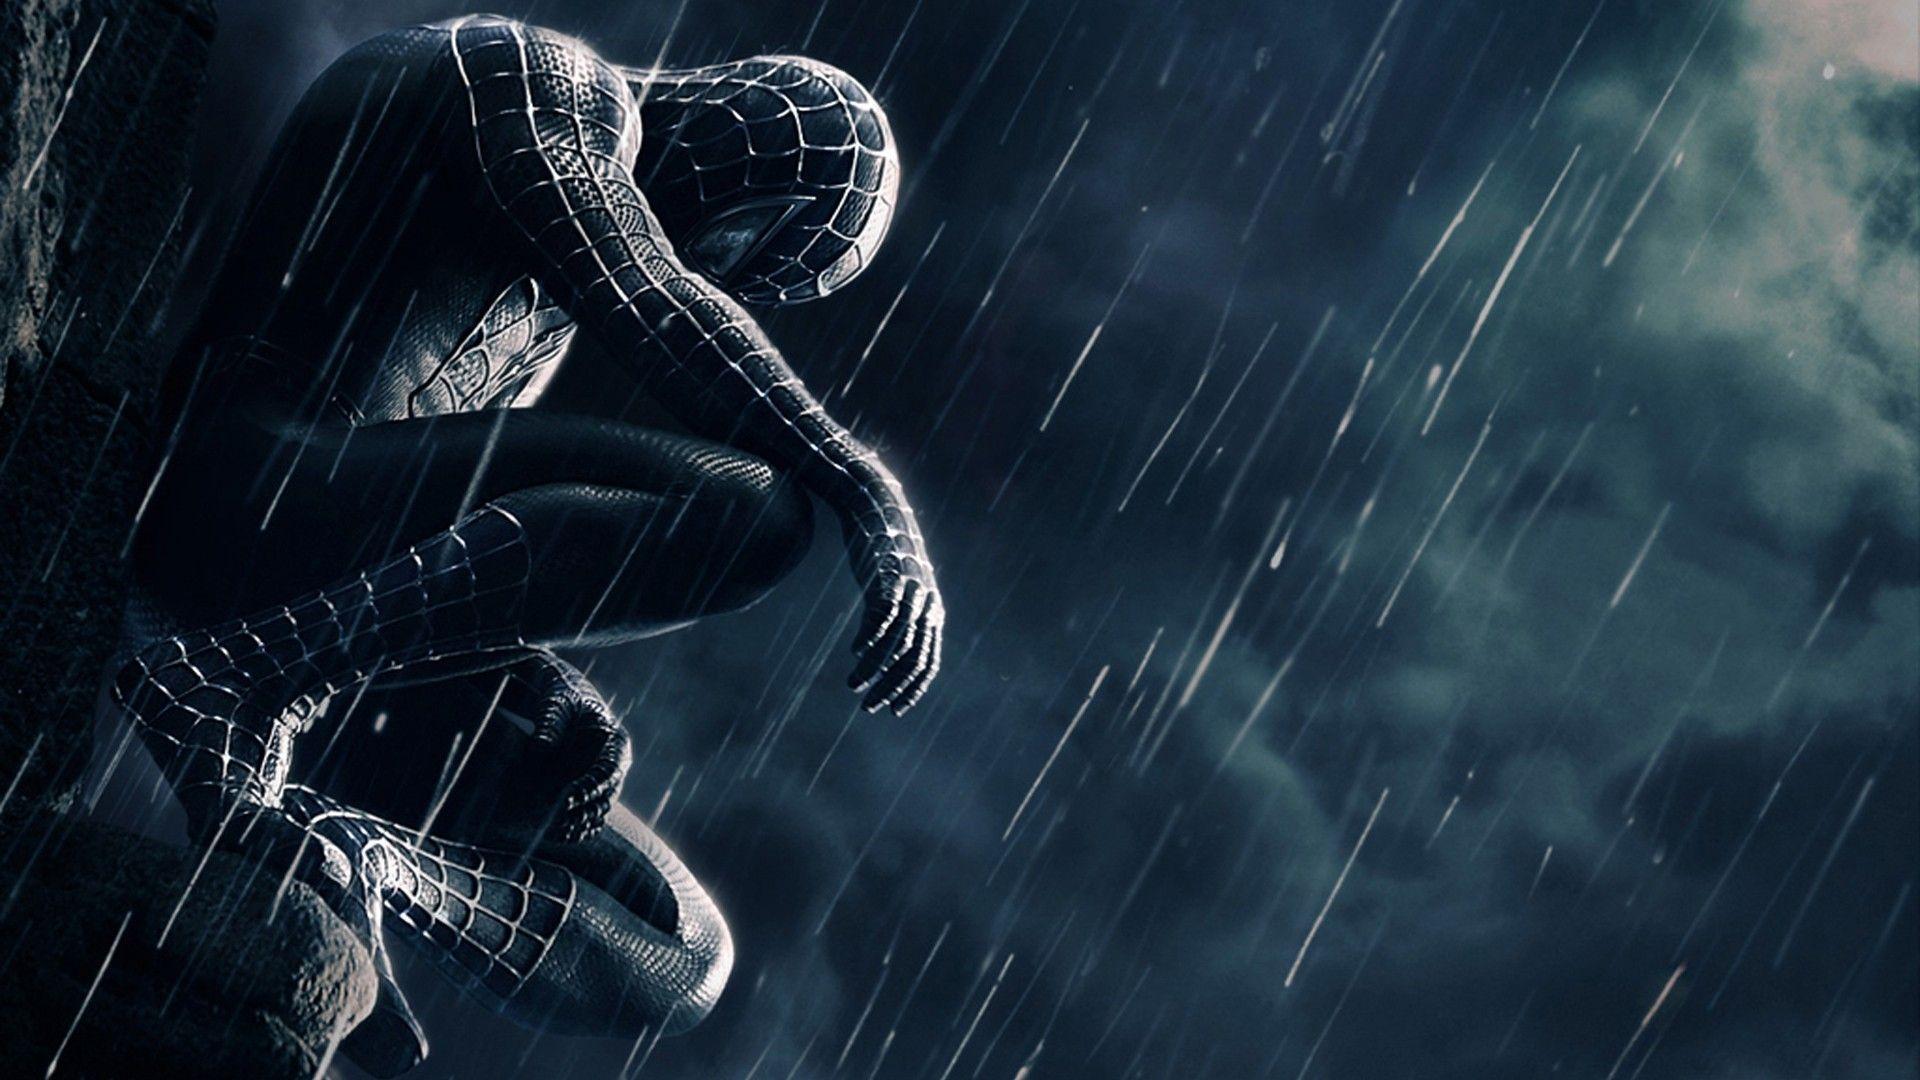 Spider-Man 3 Wallpaper...